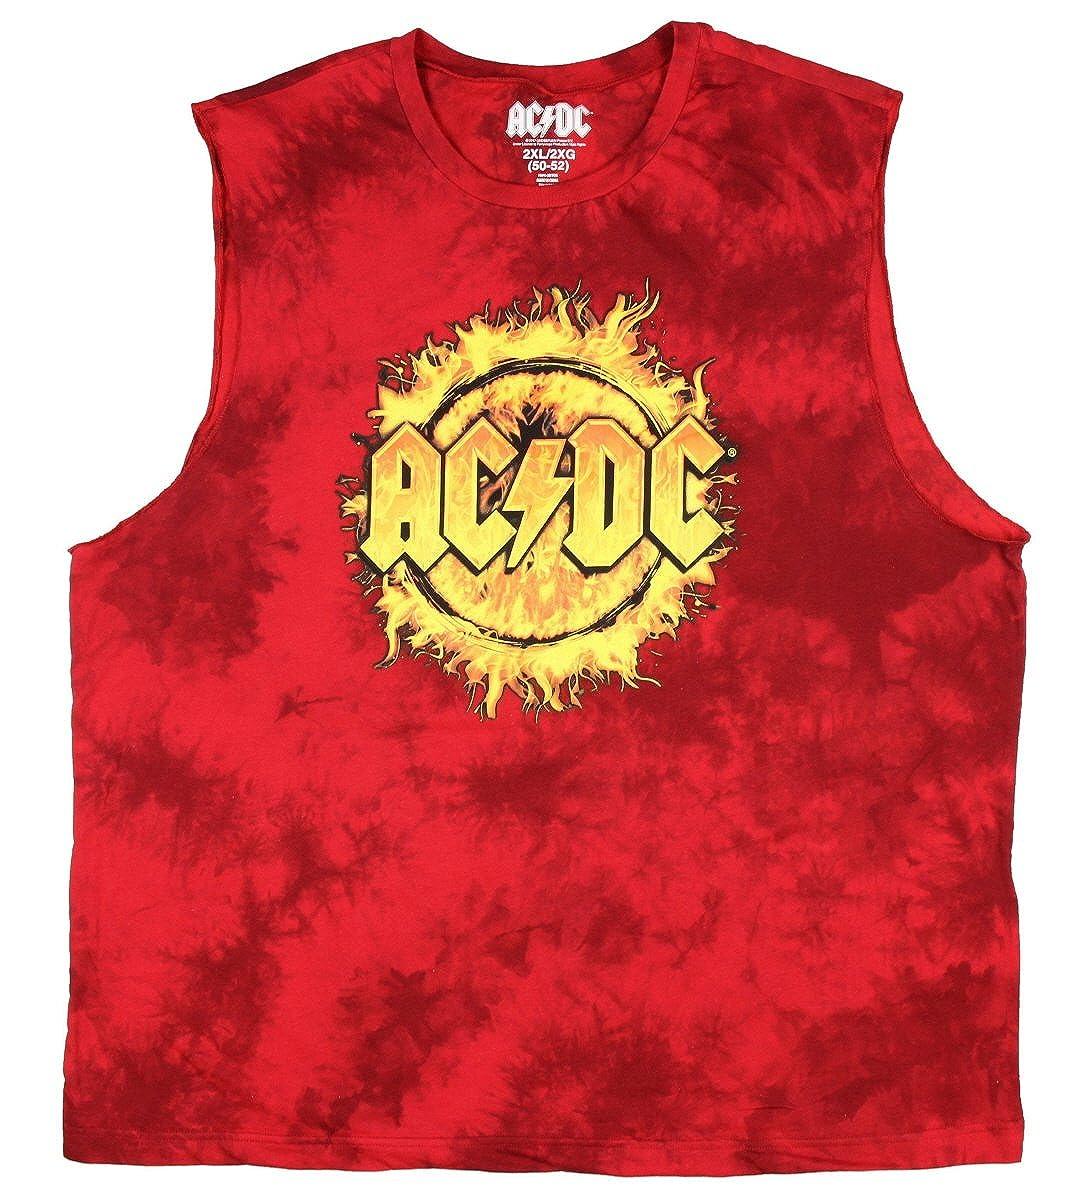 9a3a52c10e2f4f Amazon.com  AC DC Sleeveless Muscle Shirt  Clothing